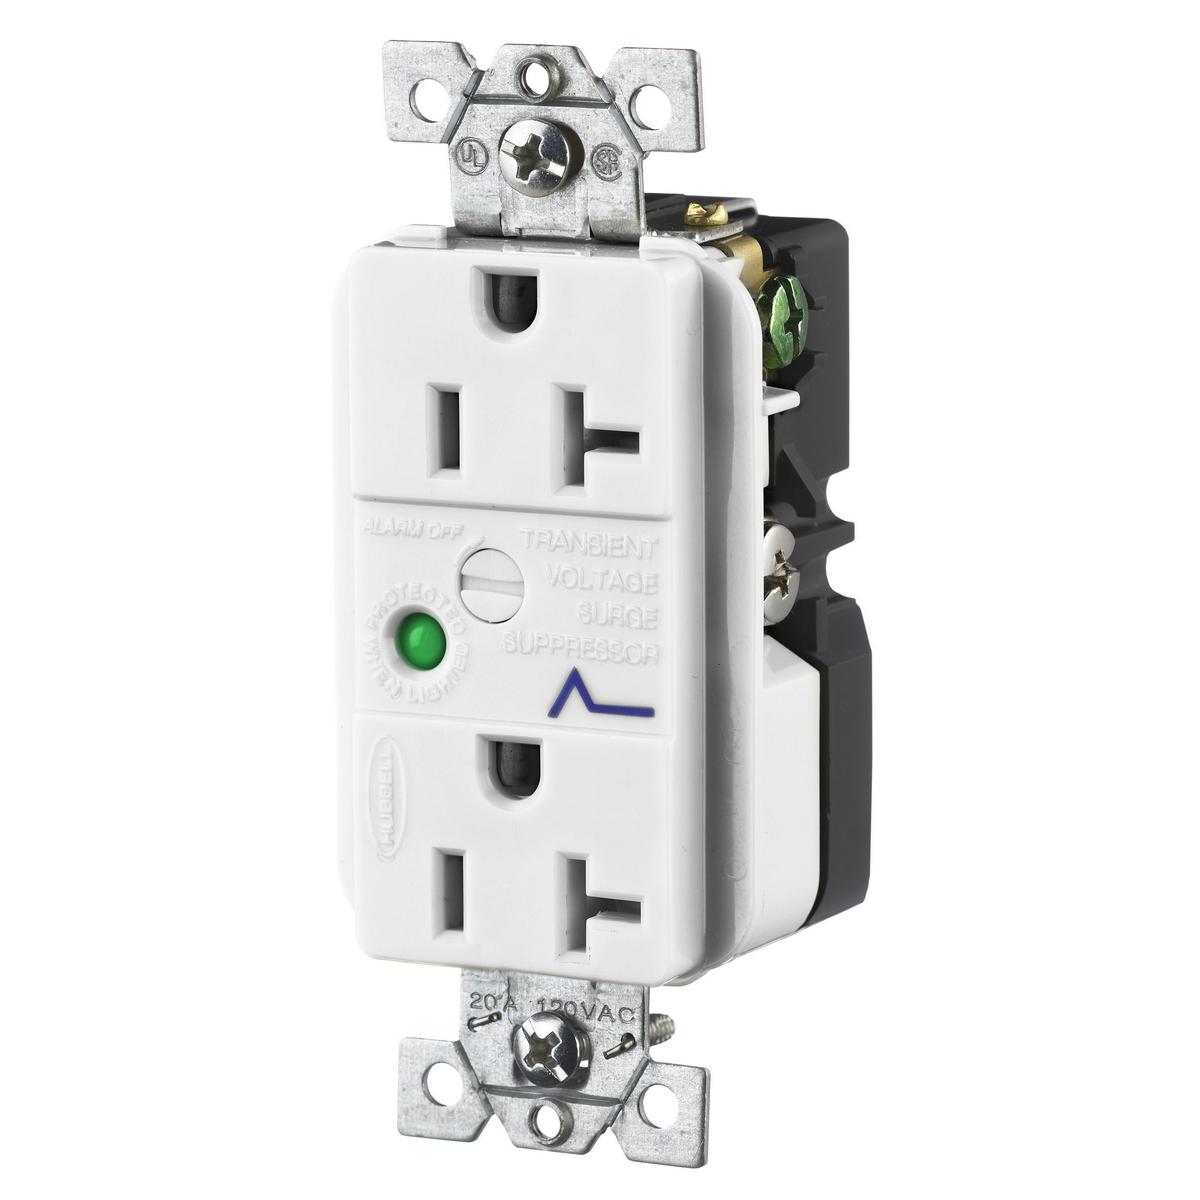 Hubbell HBL5362WSA 20 Amp 125 Volt 2-Pole 3-Wire NEMA 5-20R White Duplex Surge Suppression Receptacle